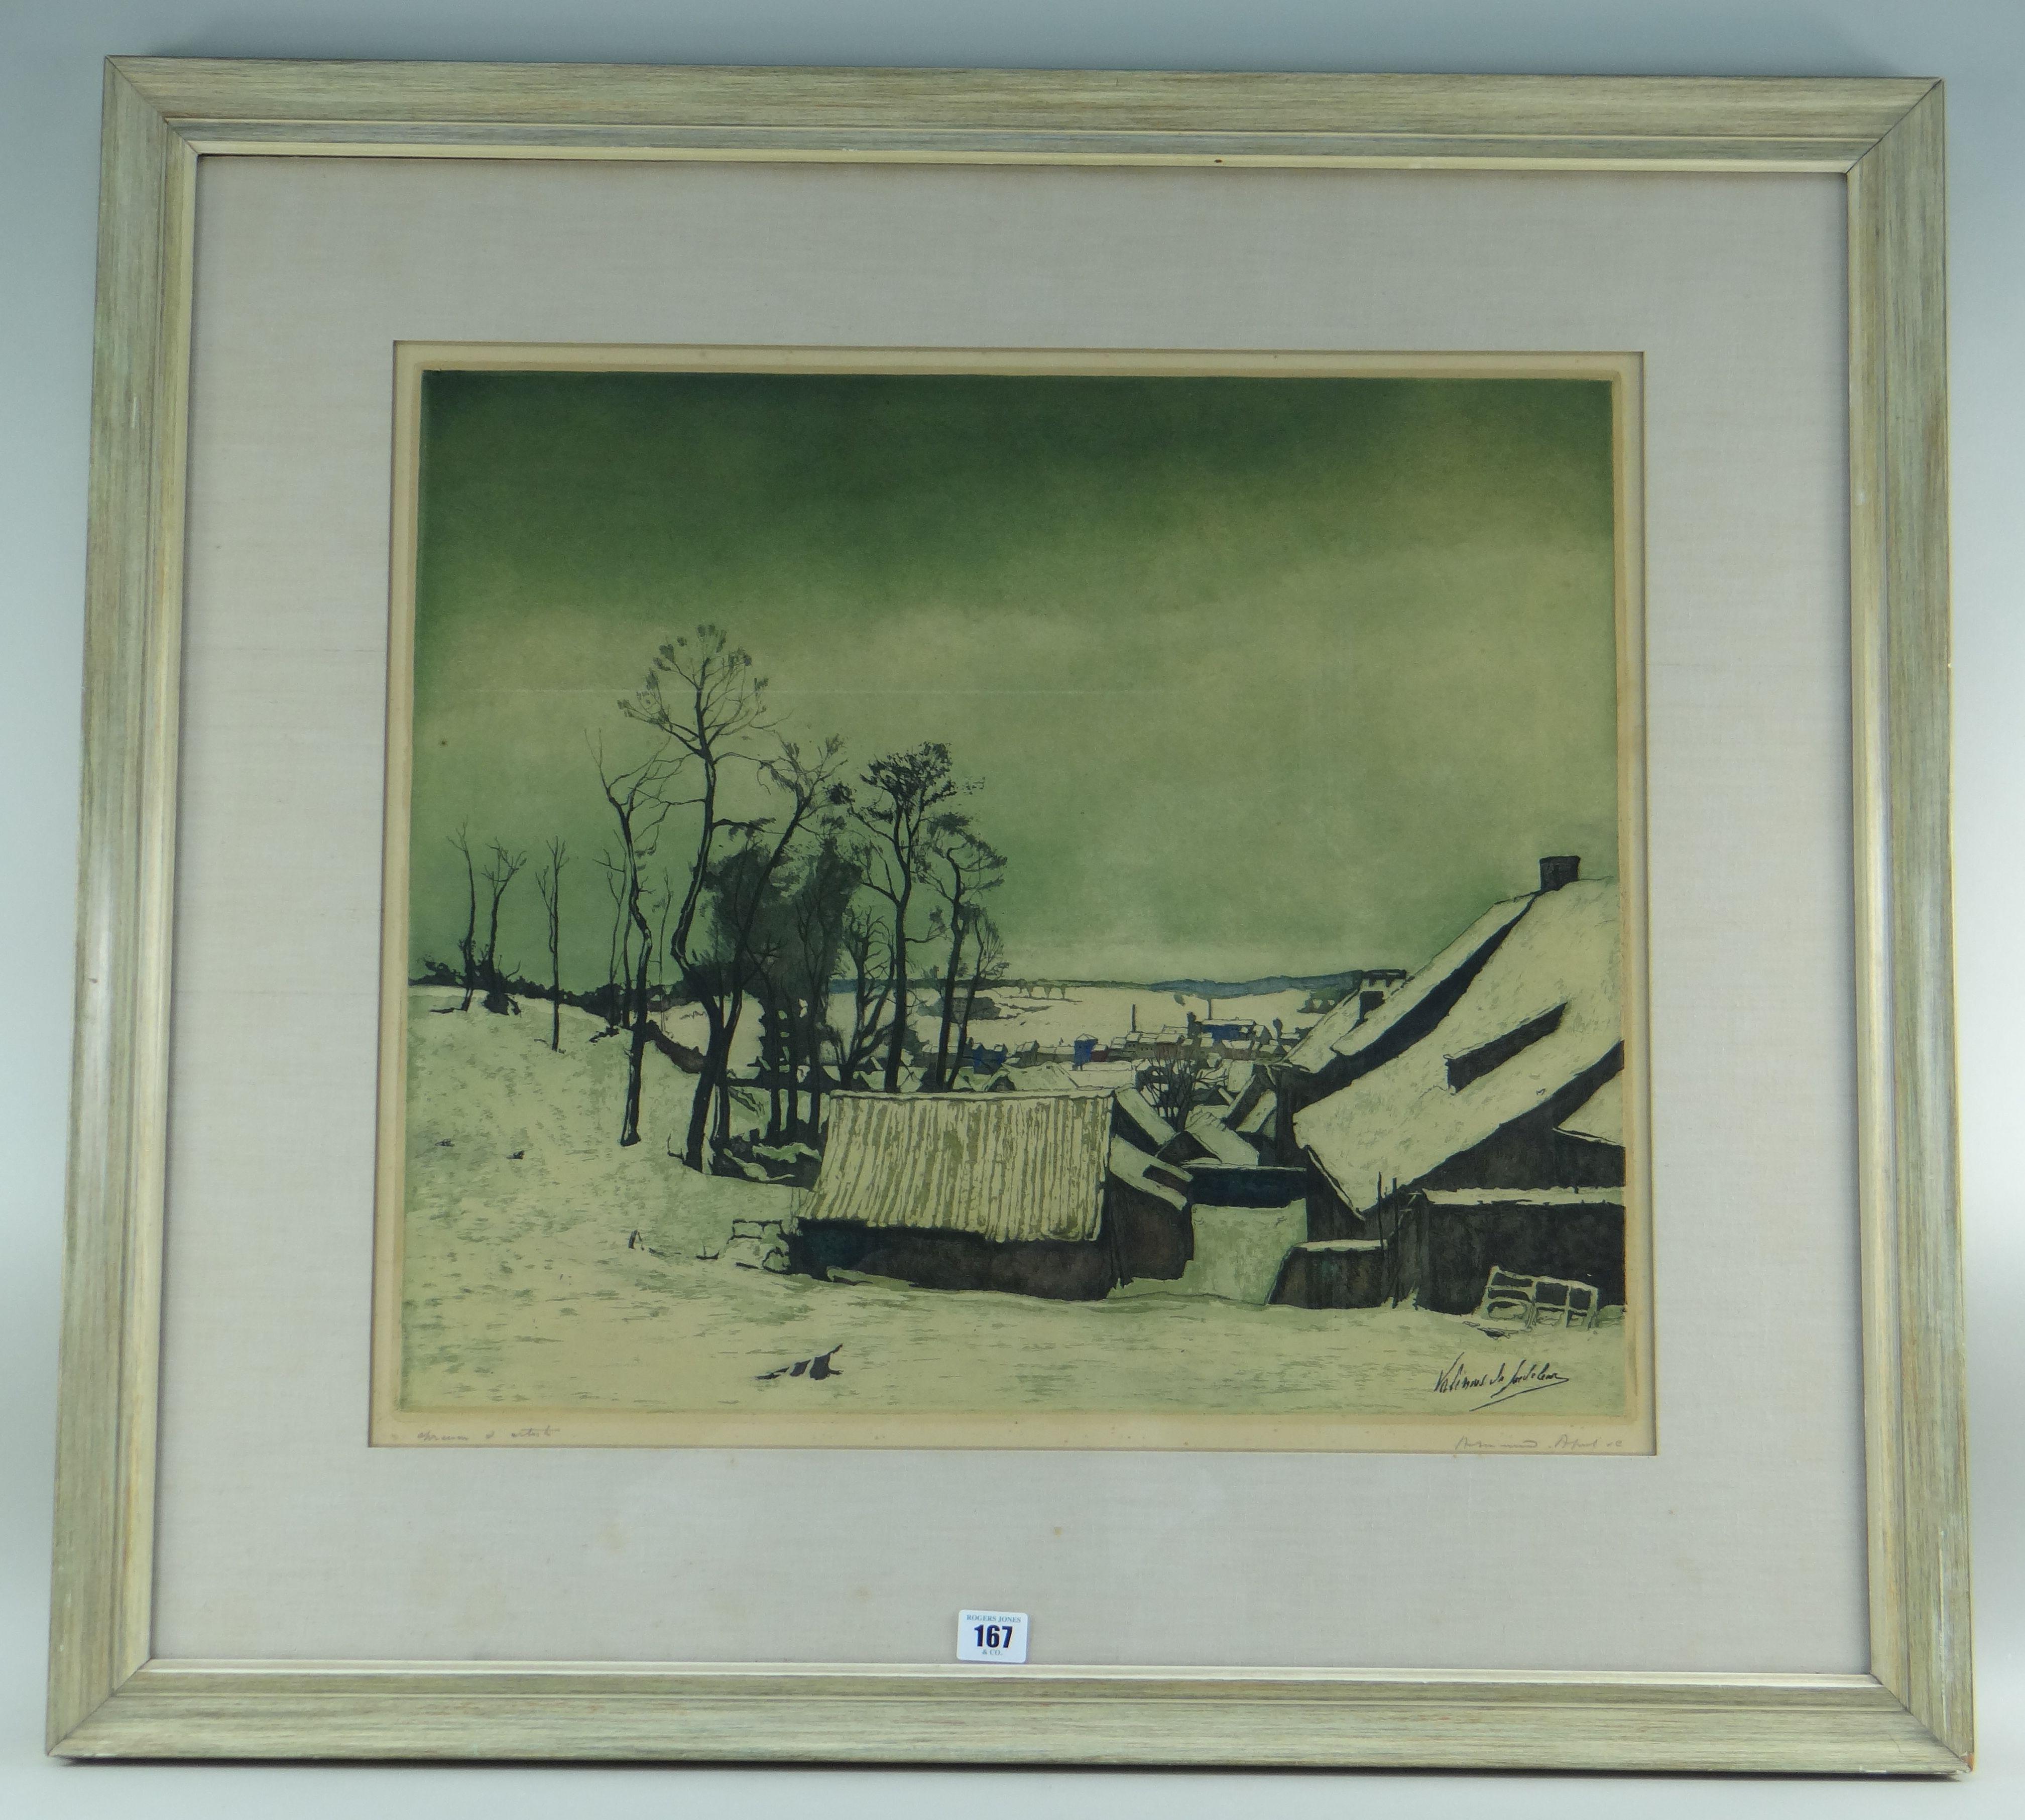 VALERIUS DE SAEDELEER limited edition (of 200) etching and aquatint épreuve d'artiste - entitled ' - Image 2 of 2